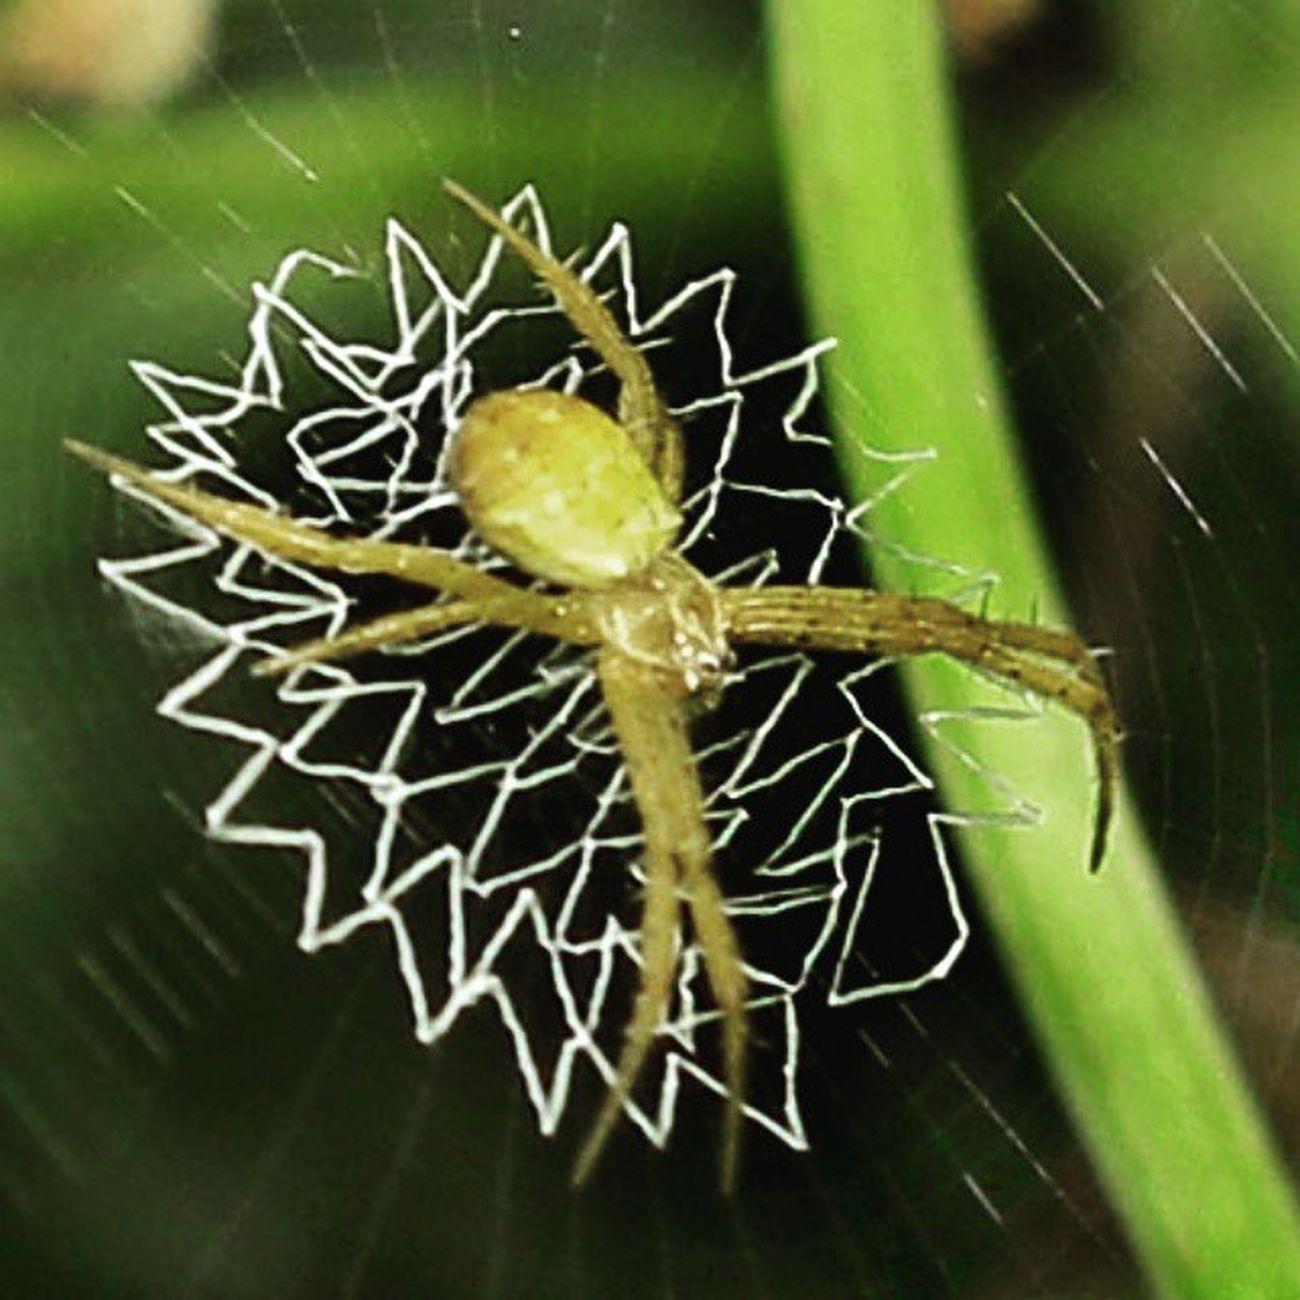 Sarangku okeee... Spider Spiderworld Spiderweb Ig_spiders ig_spider tgif_macro tgif_insects alalamiya_macro KINGS_INSECTS macroworld_tr